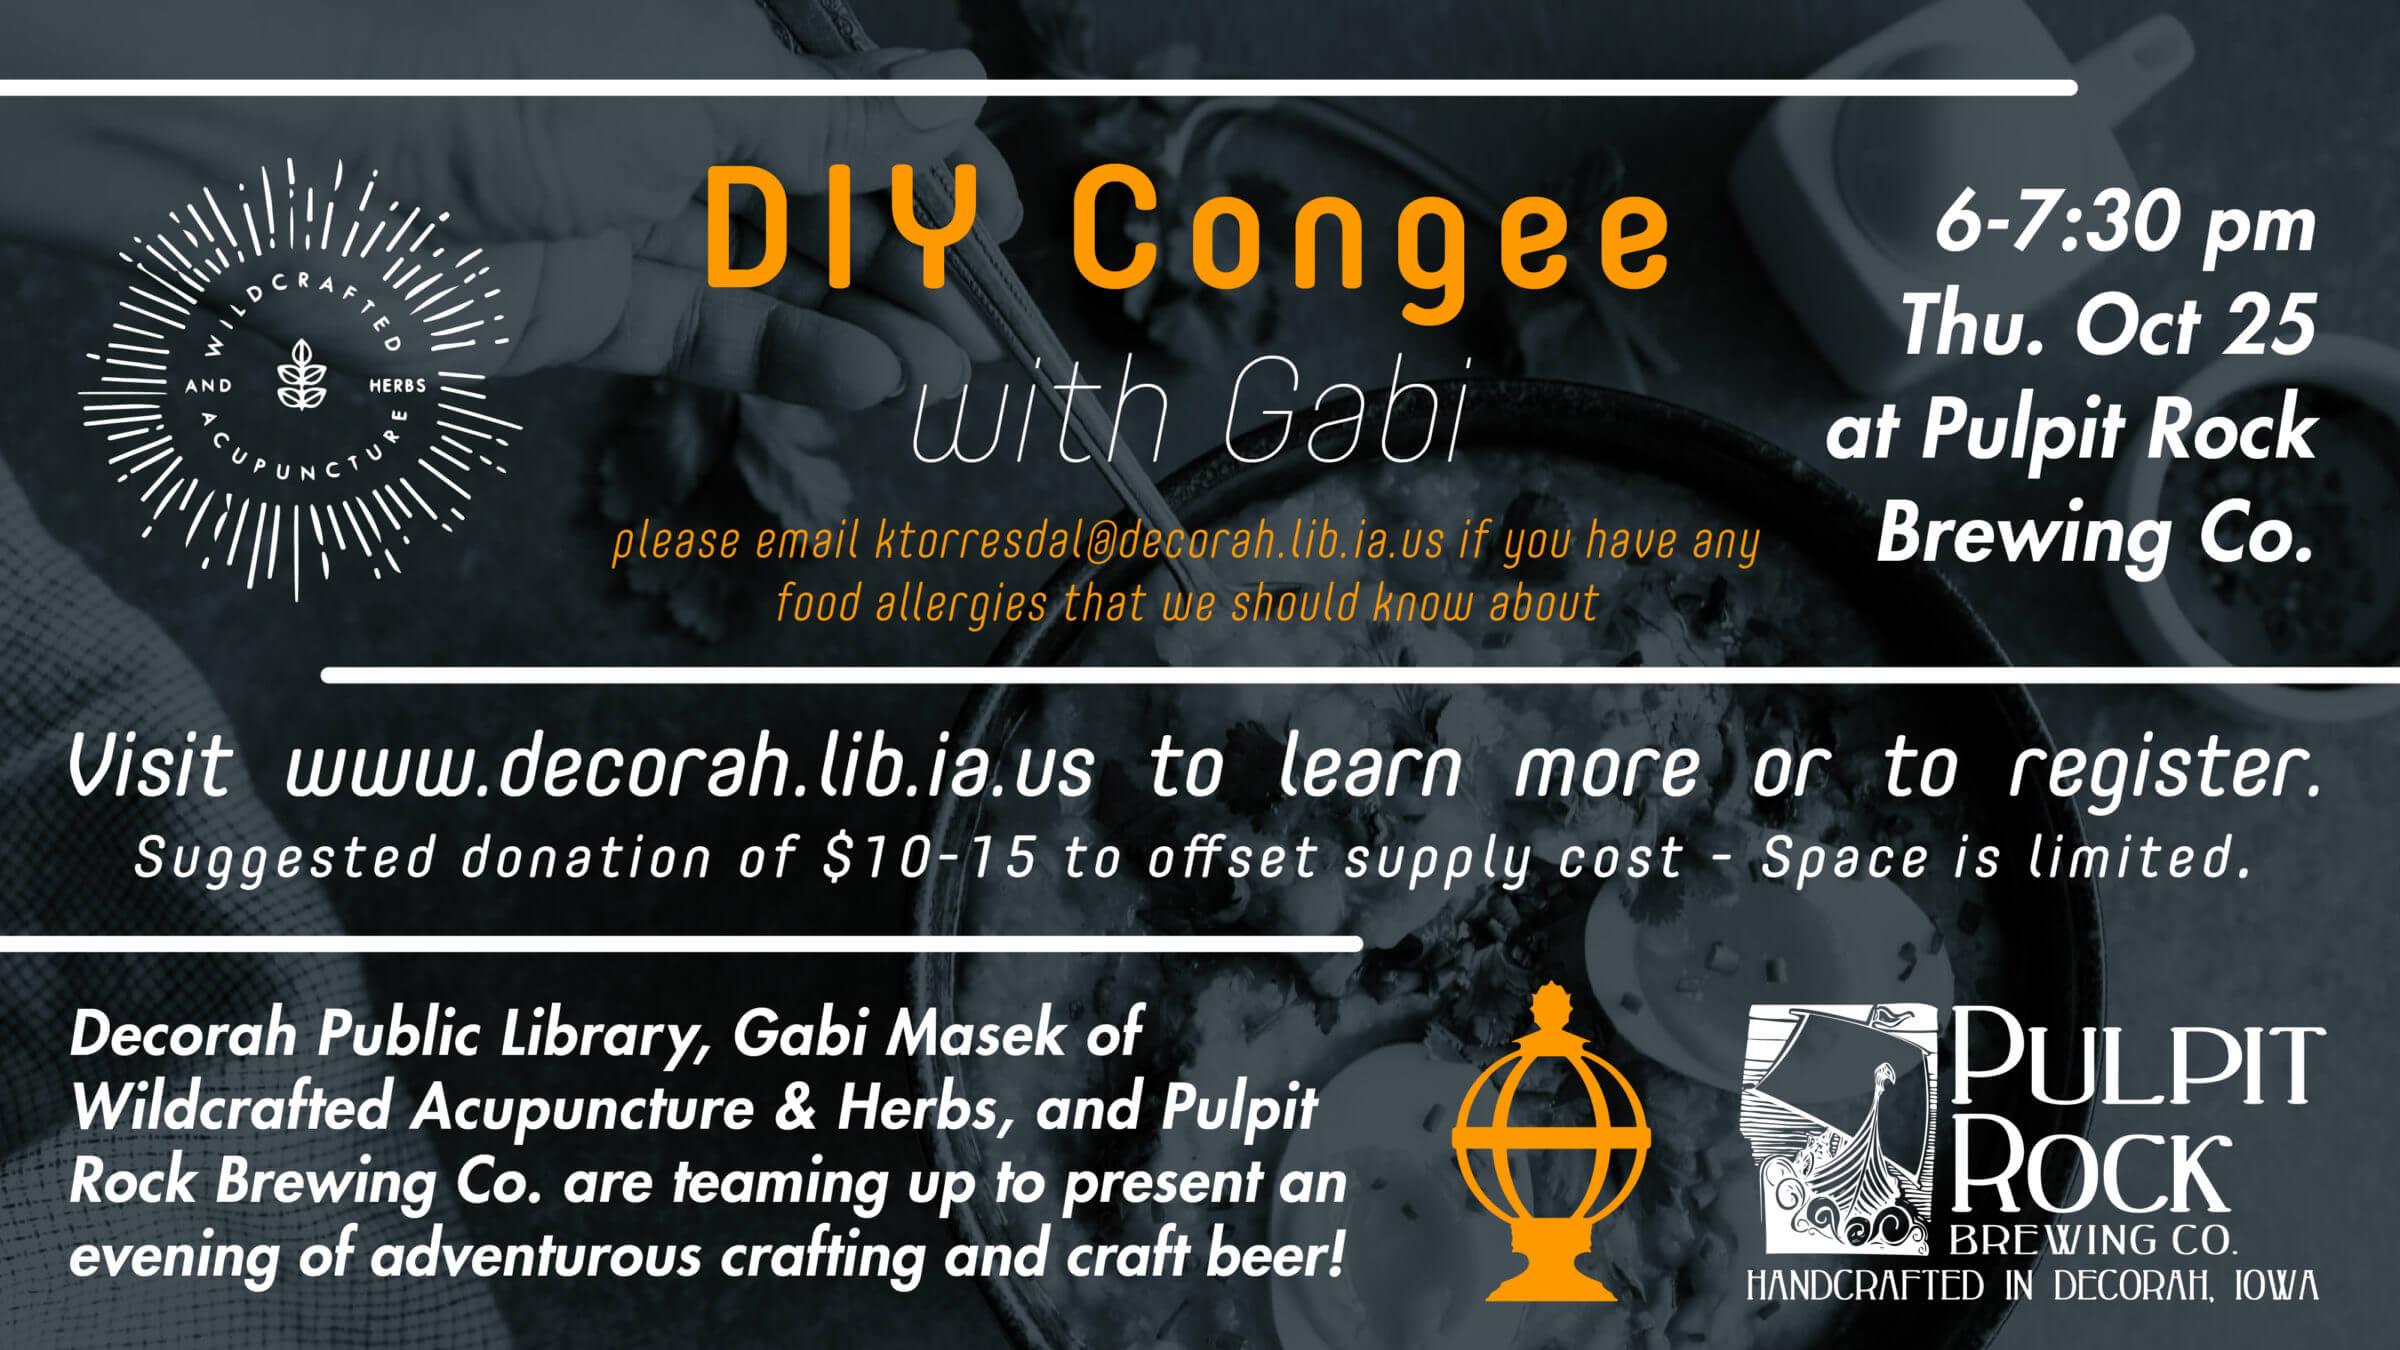 DIY Congee with Gabi